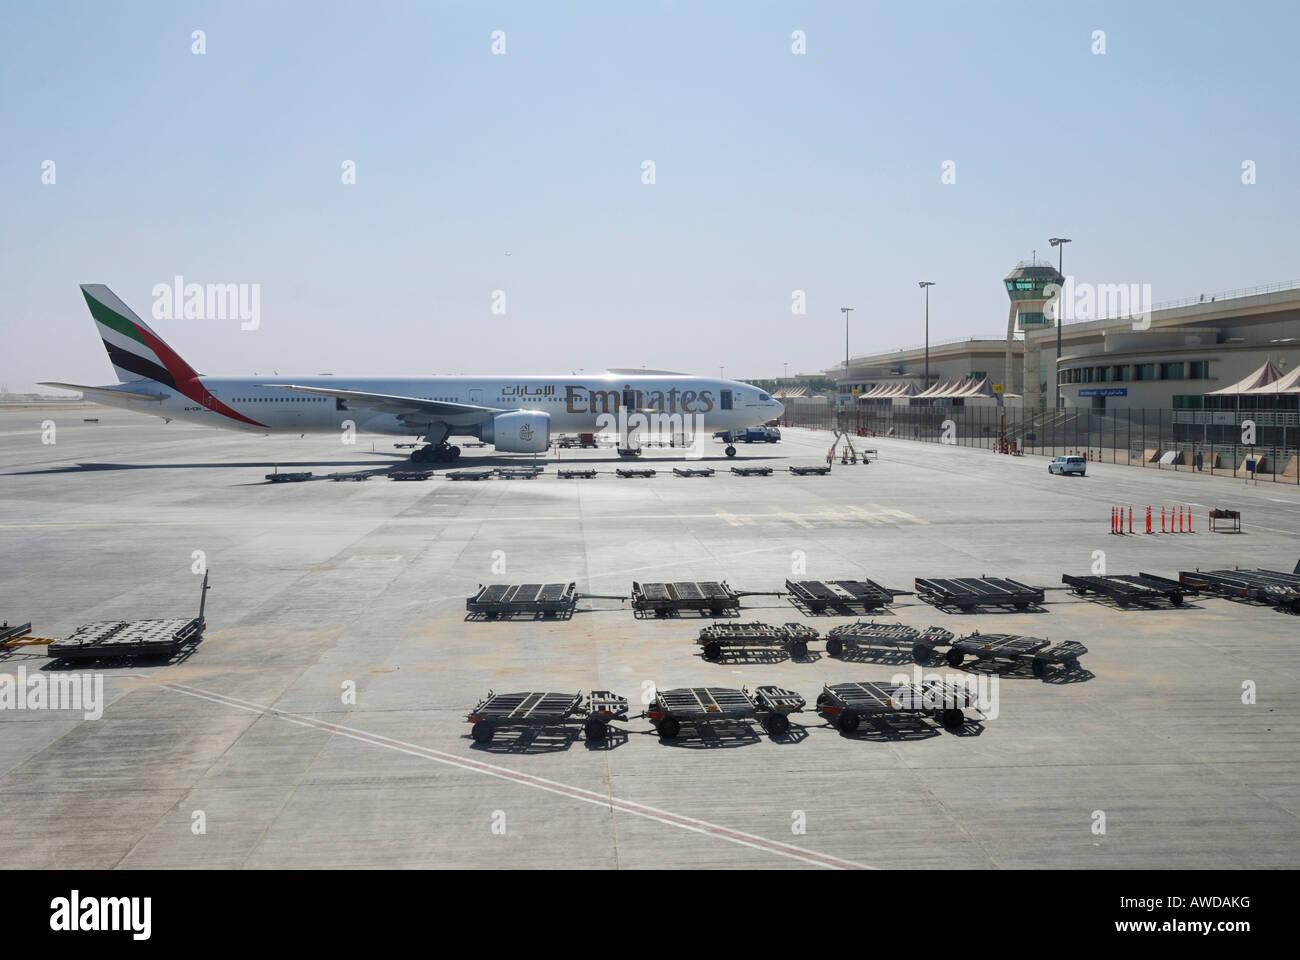 "Boeing 777-300 of the airline ""Emirates"" at Dubai International Airport, United Arab Emirates Stock Photo"